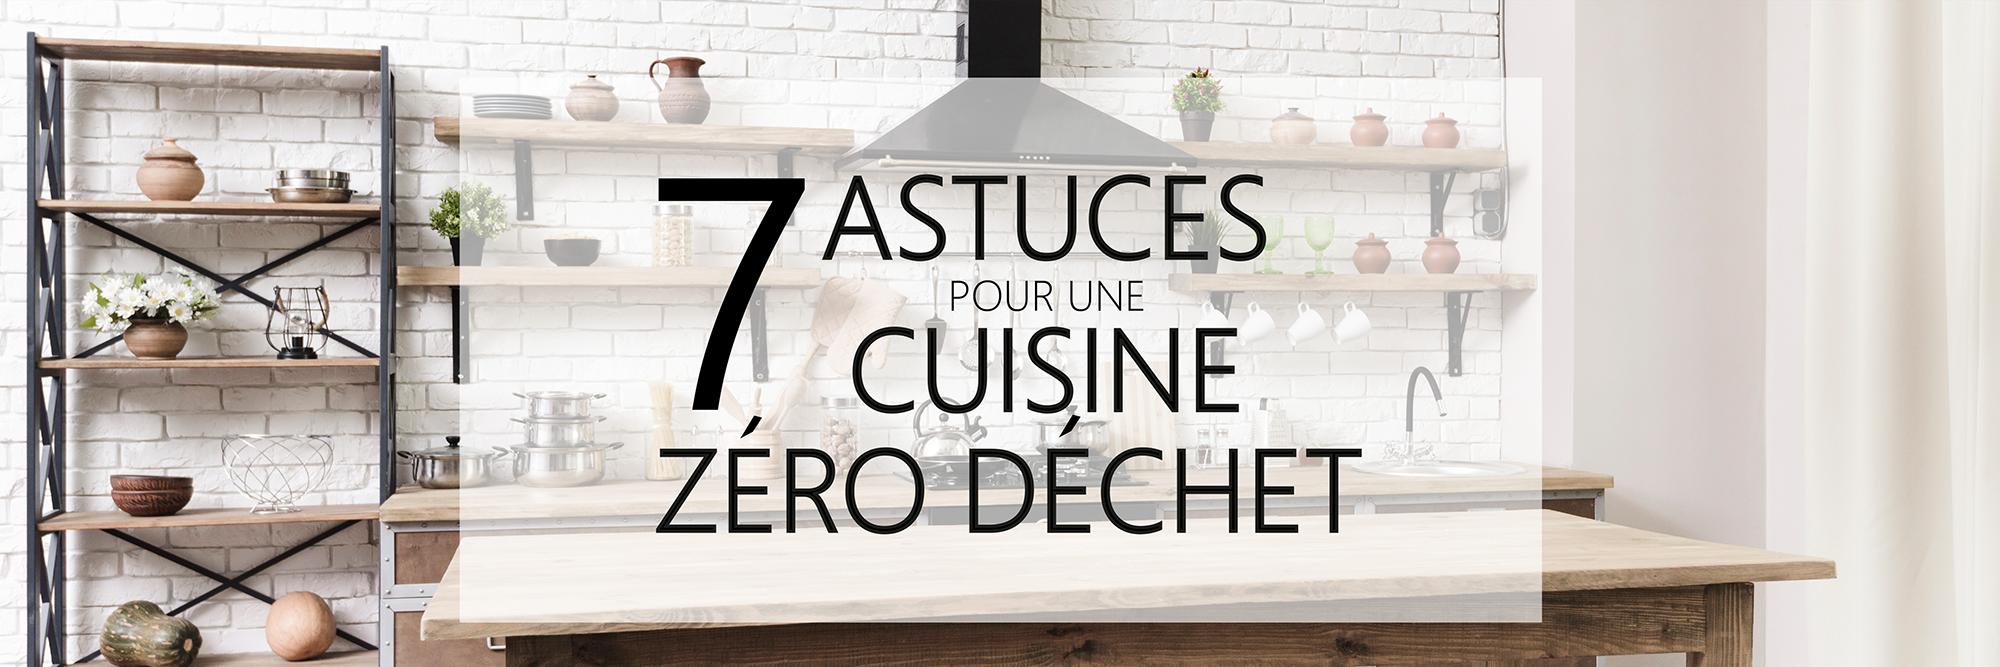 7 astuces pour une cuisine zero dechet